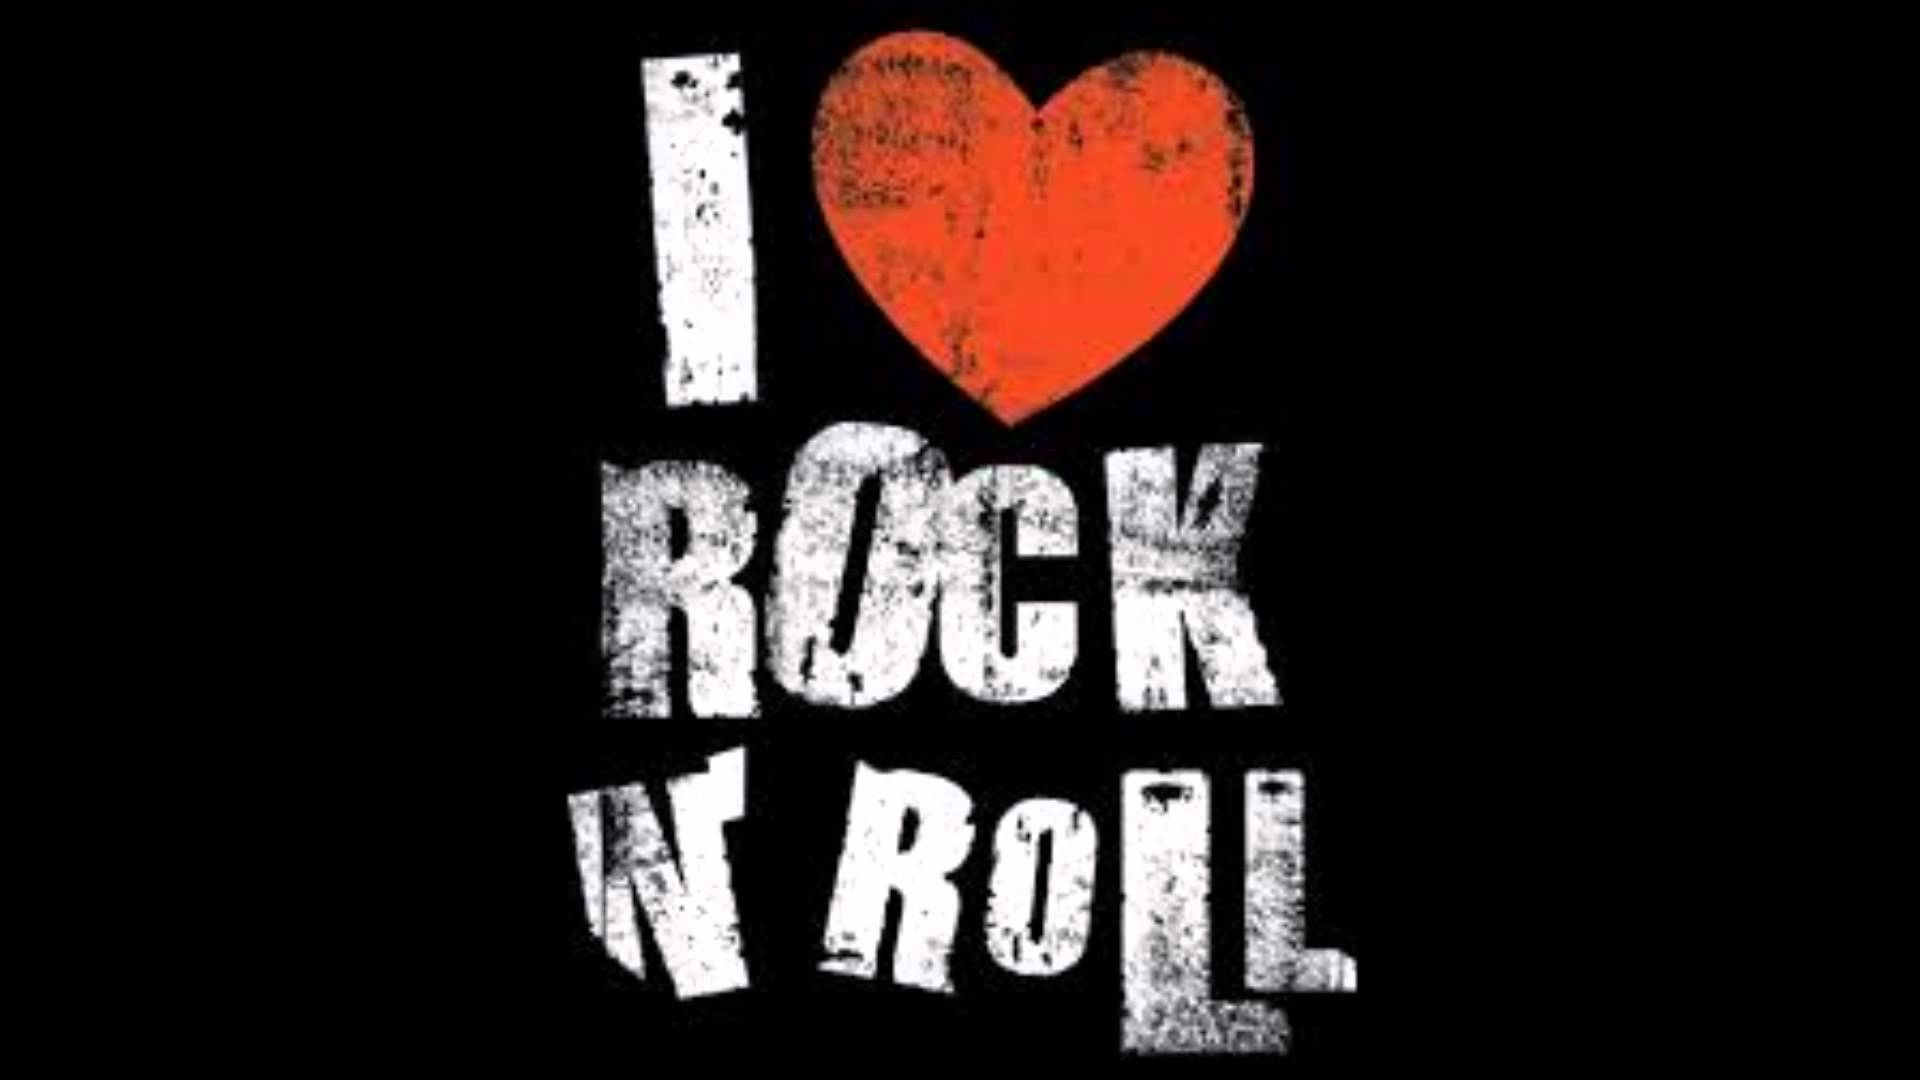 I Love Rock Wallpapers Wallpaper Cave